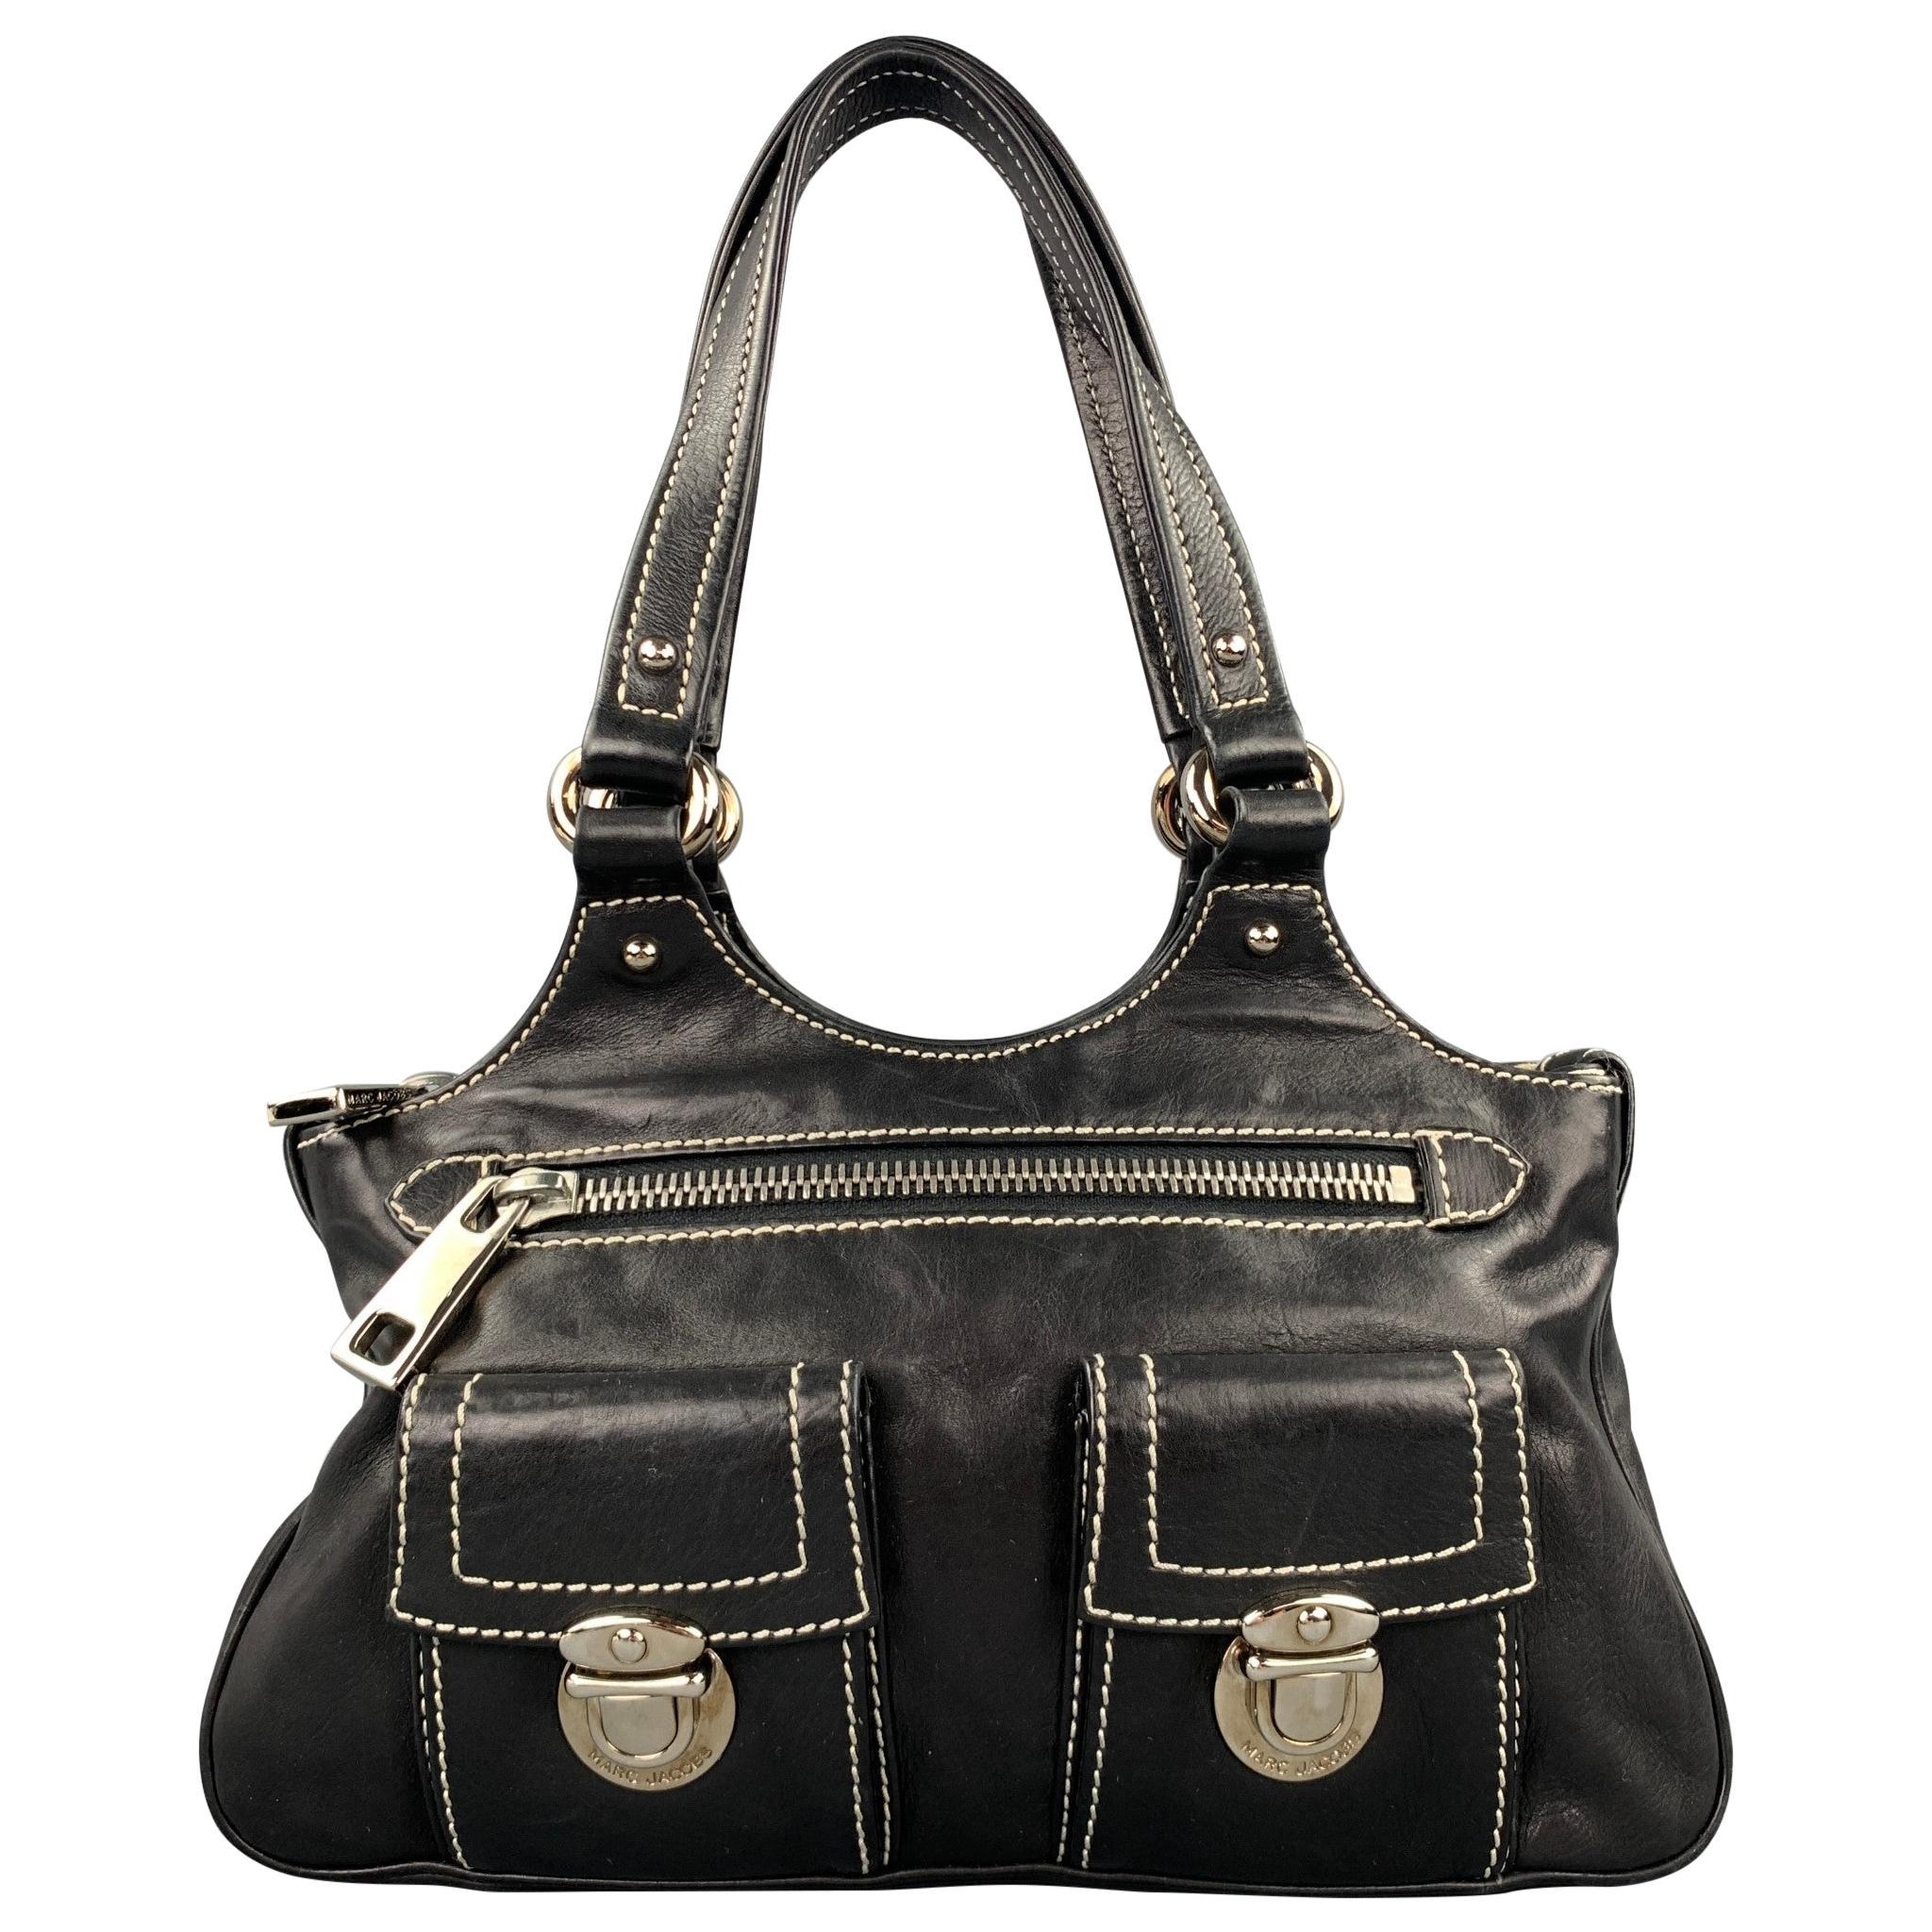 MARC JACOBS Black Contrast Stitch Leather Top Handles Handbag